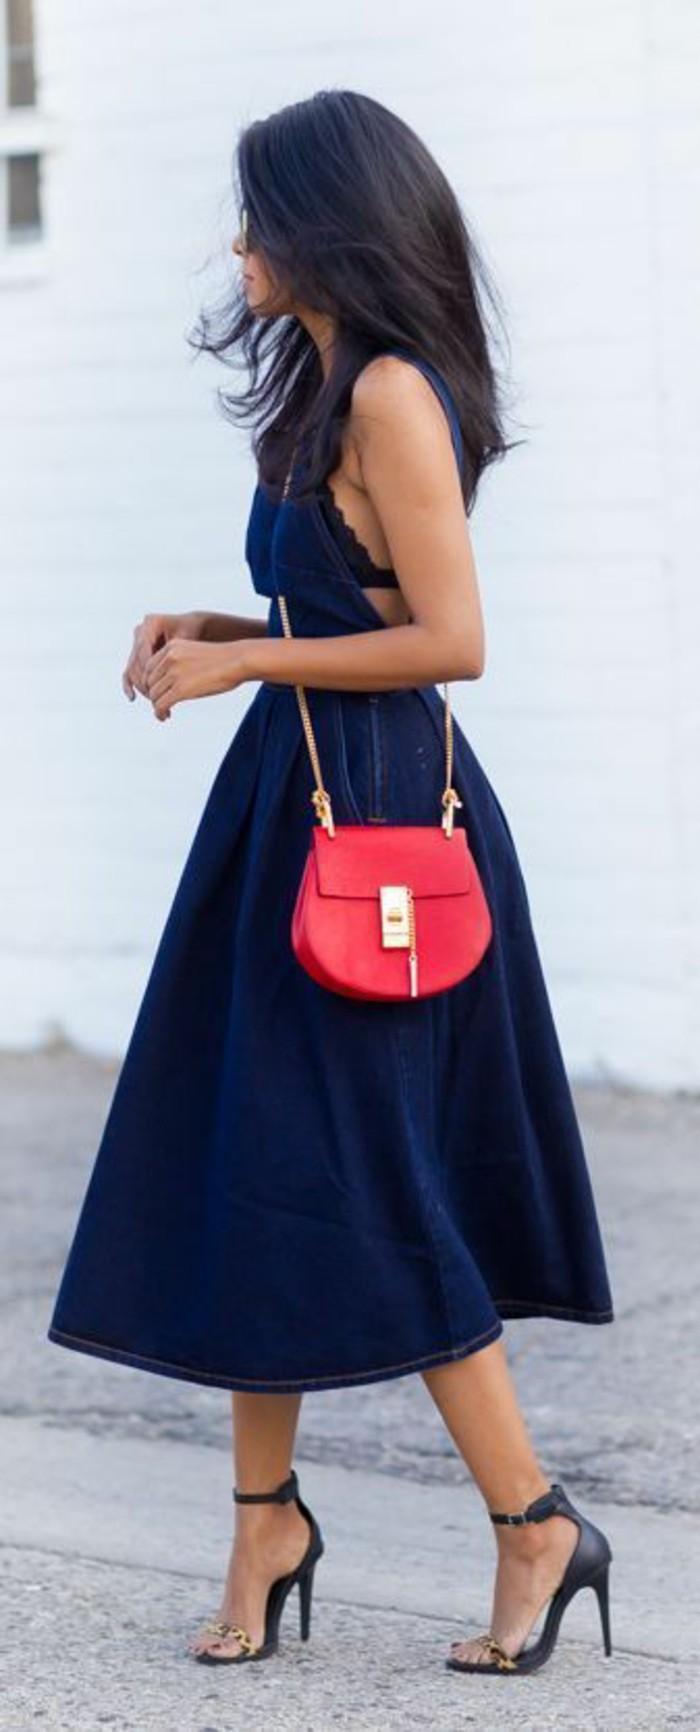 sac-a-main-rouge-petite-robe-velours-femme-comment-porter